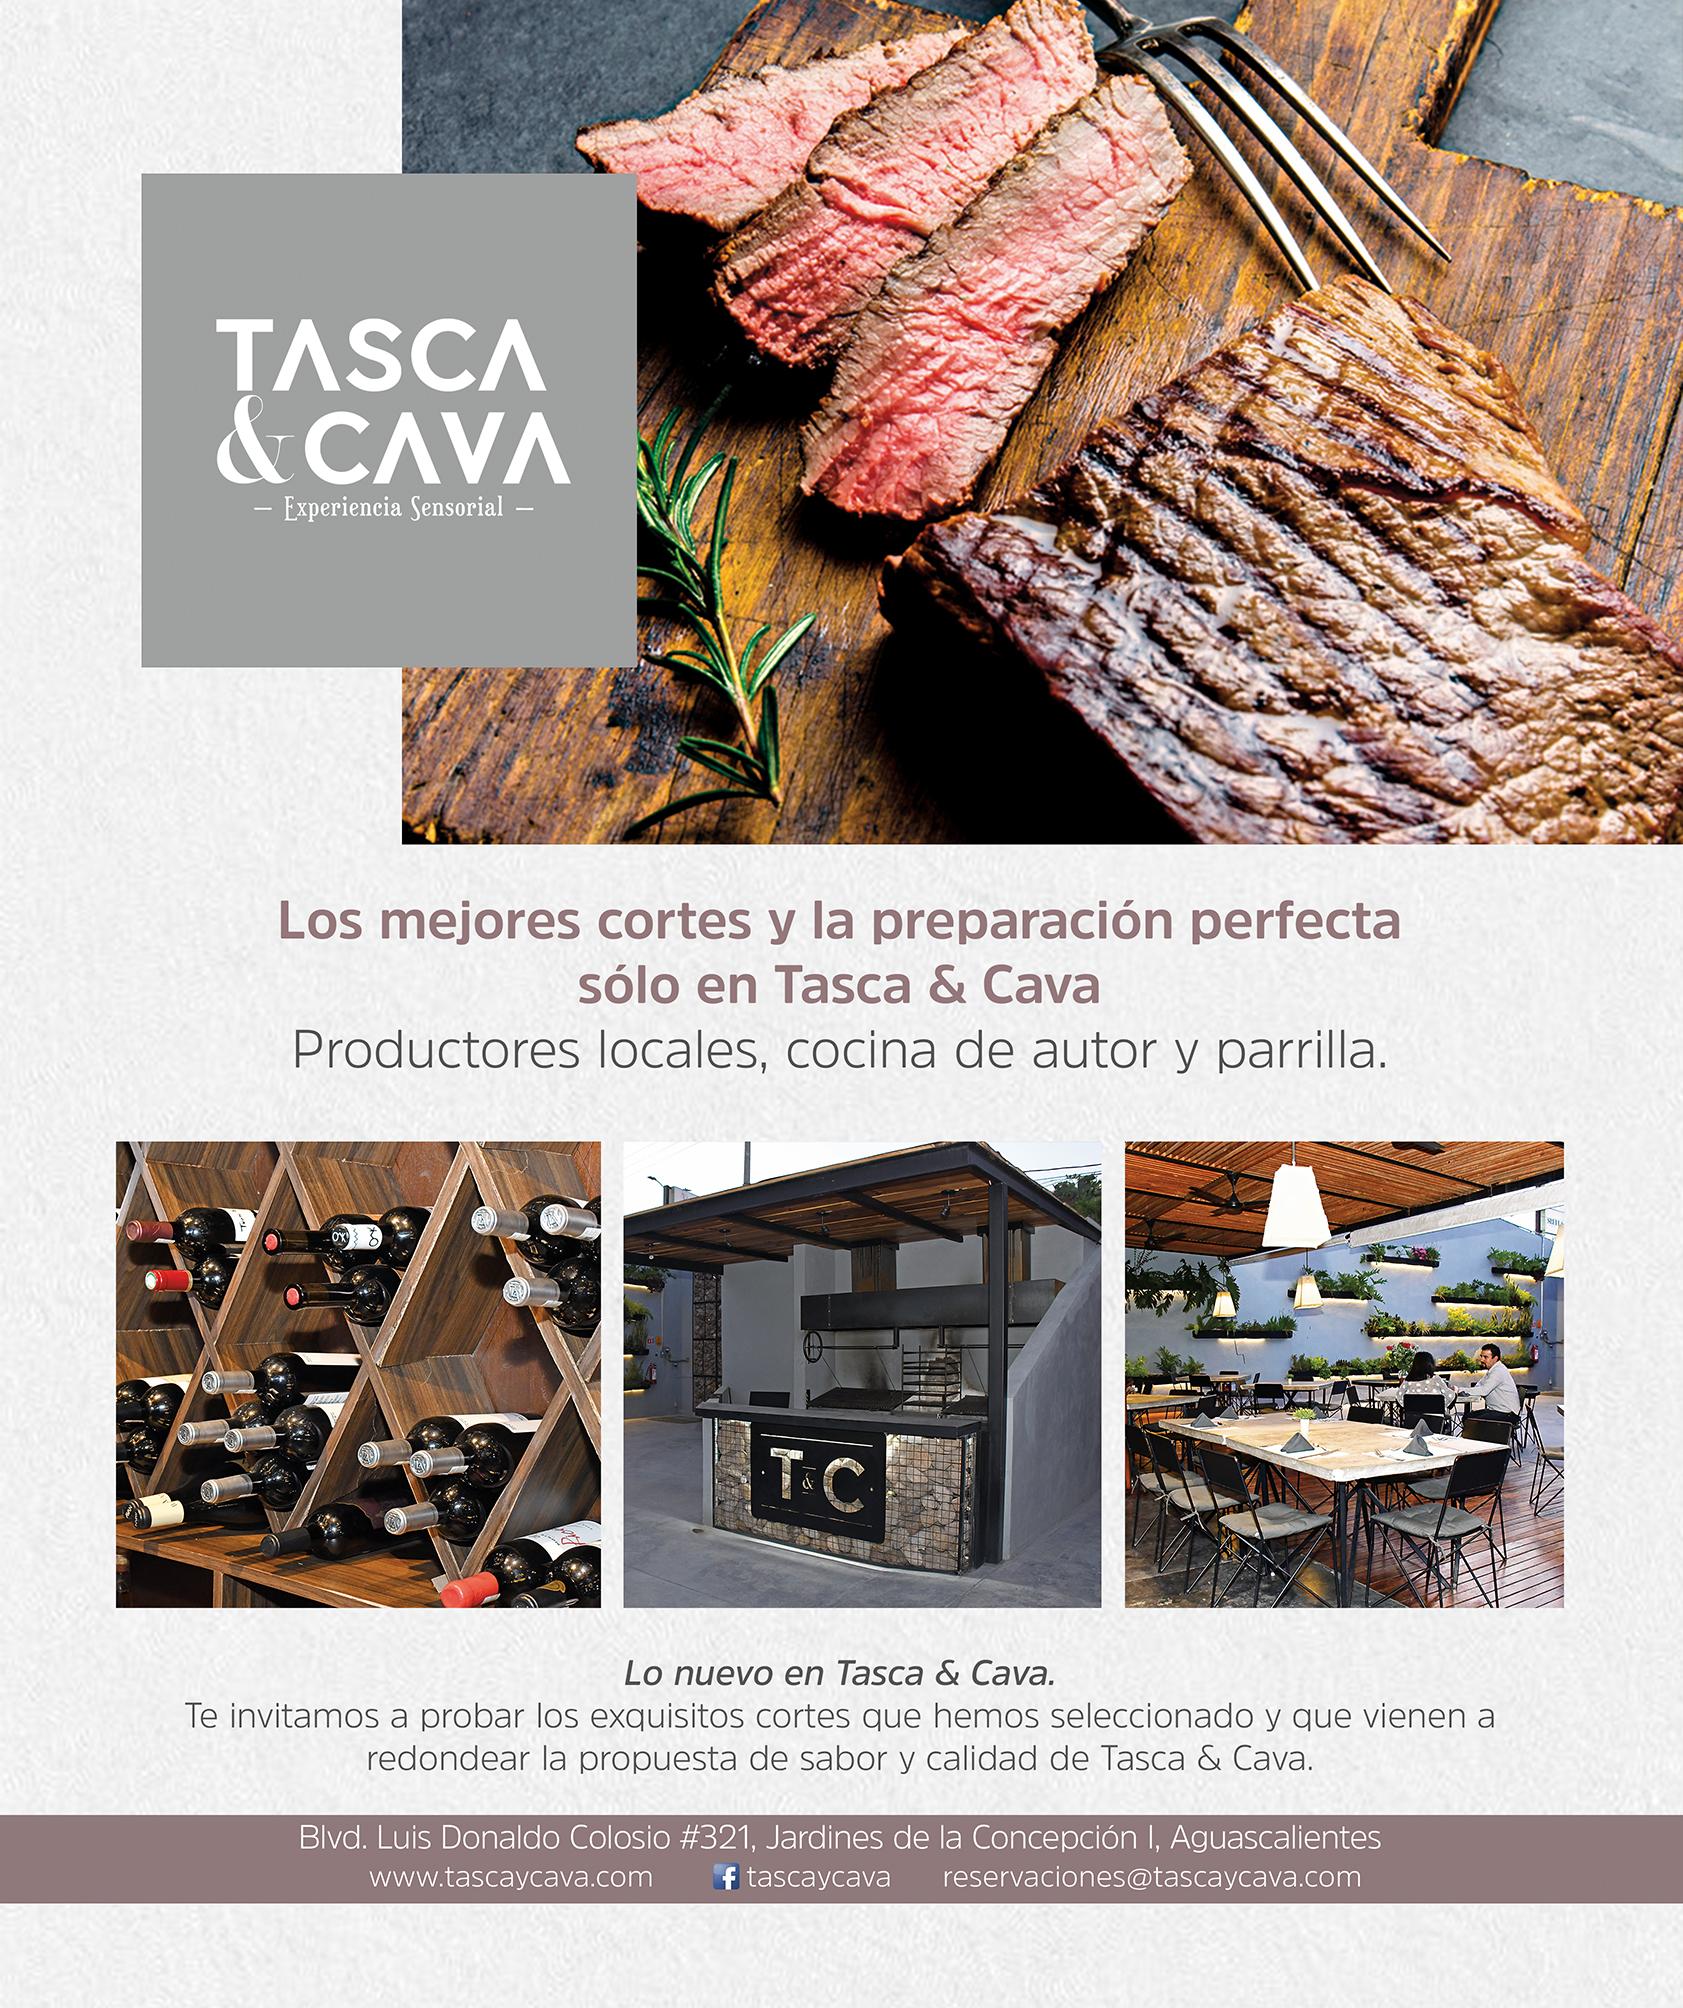 TASCA Y CAVA